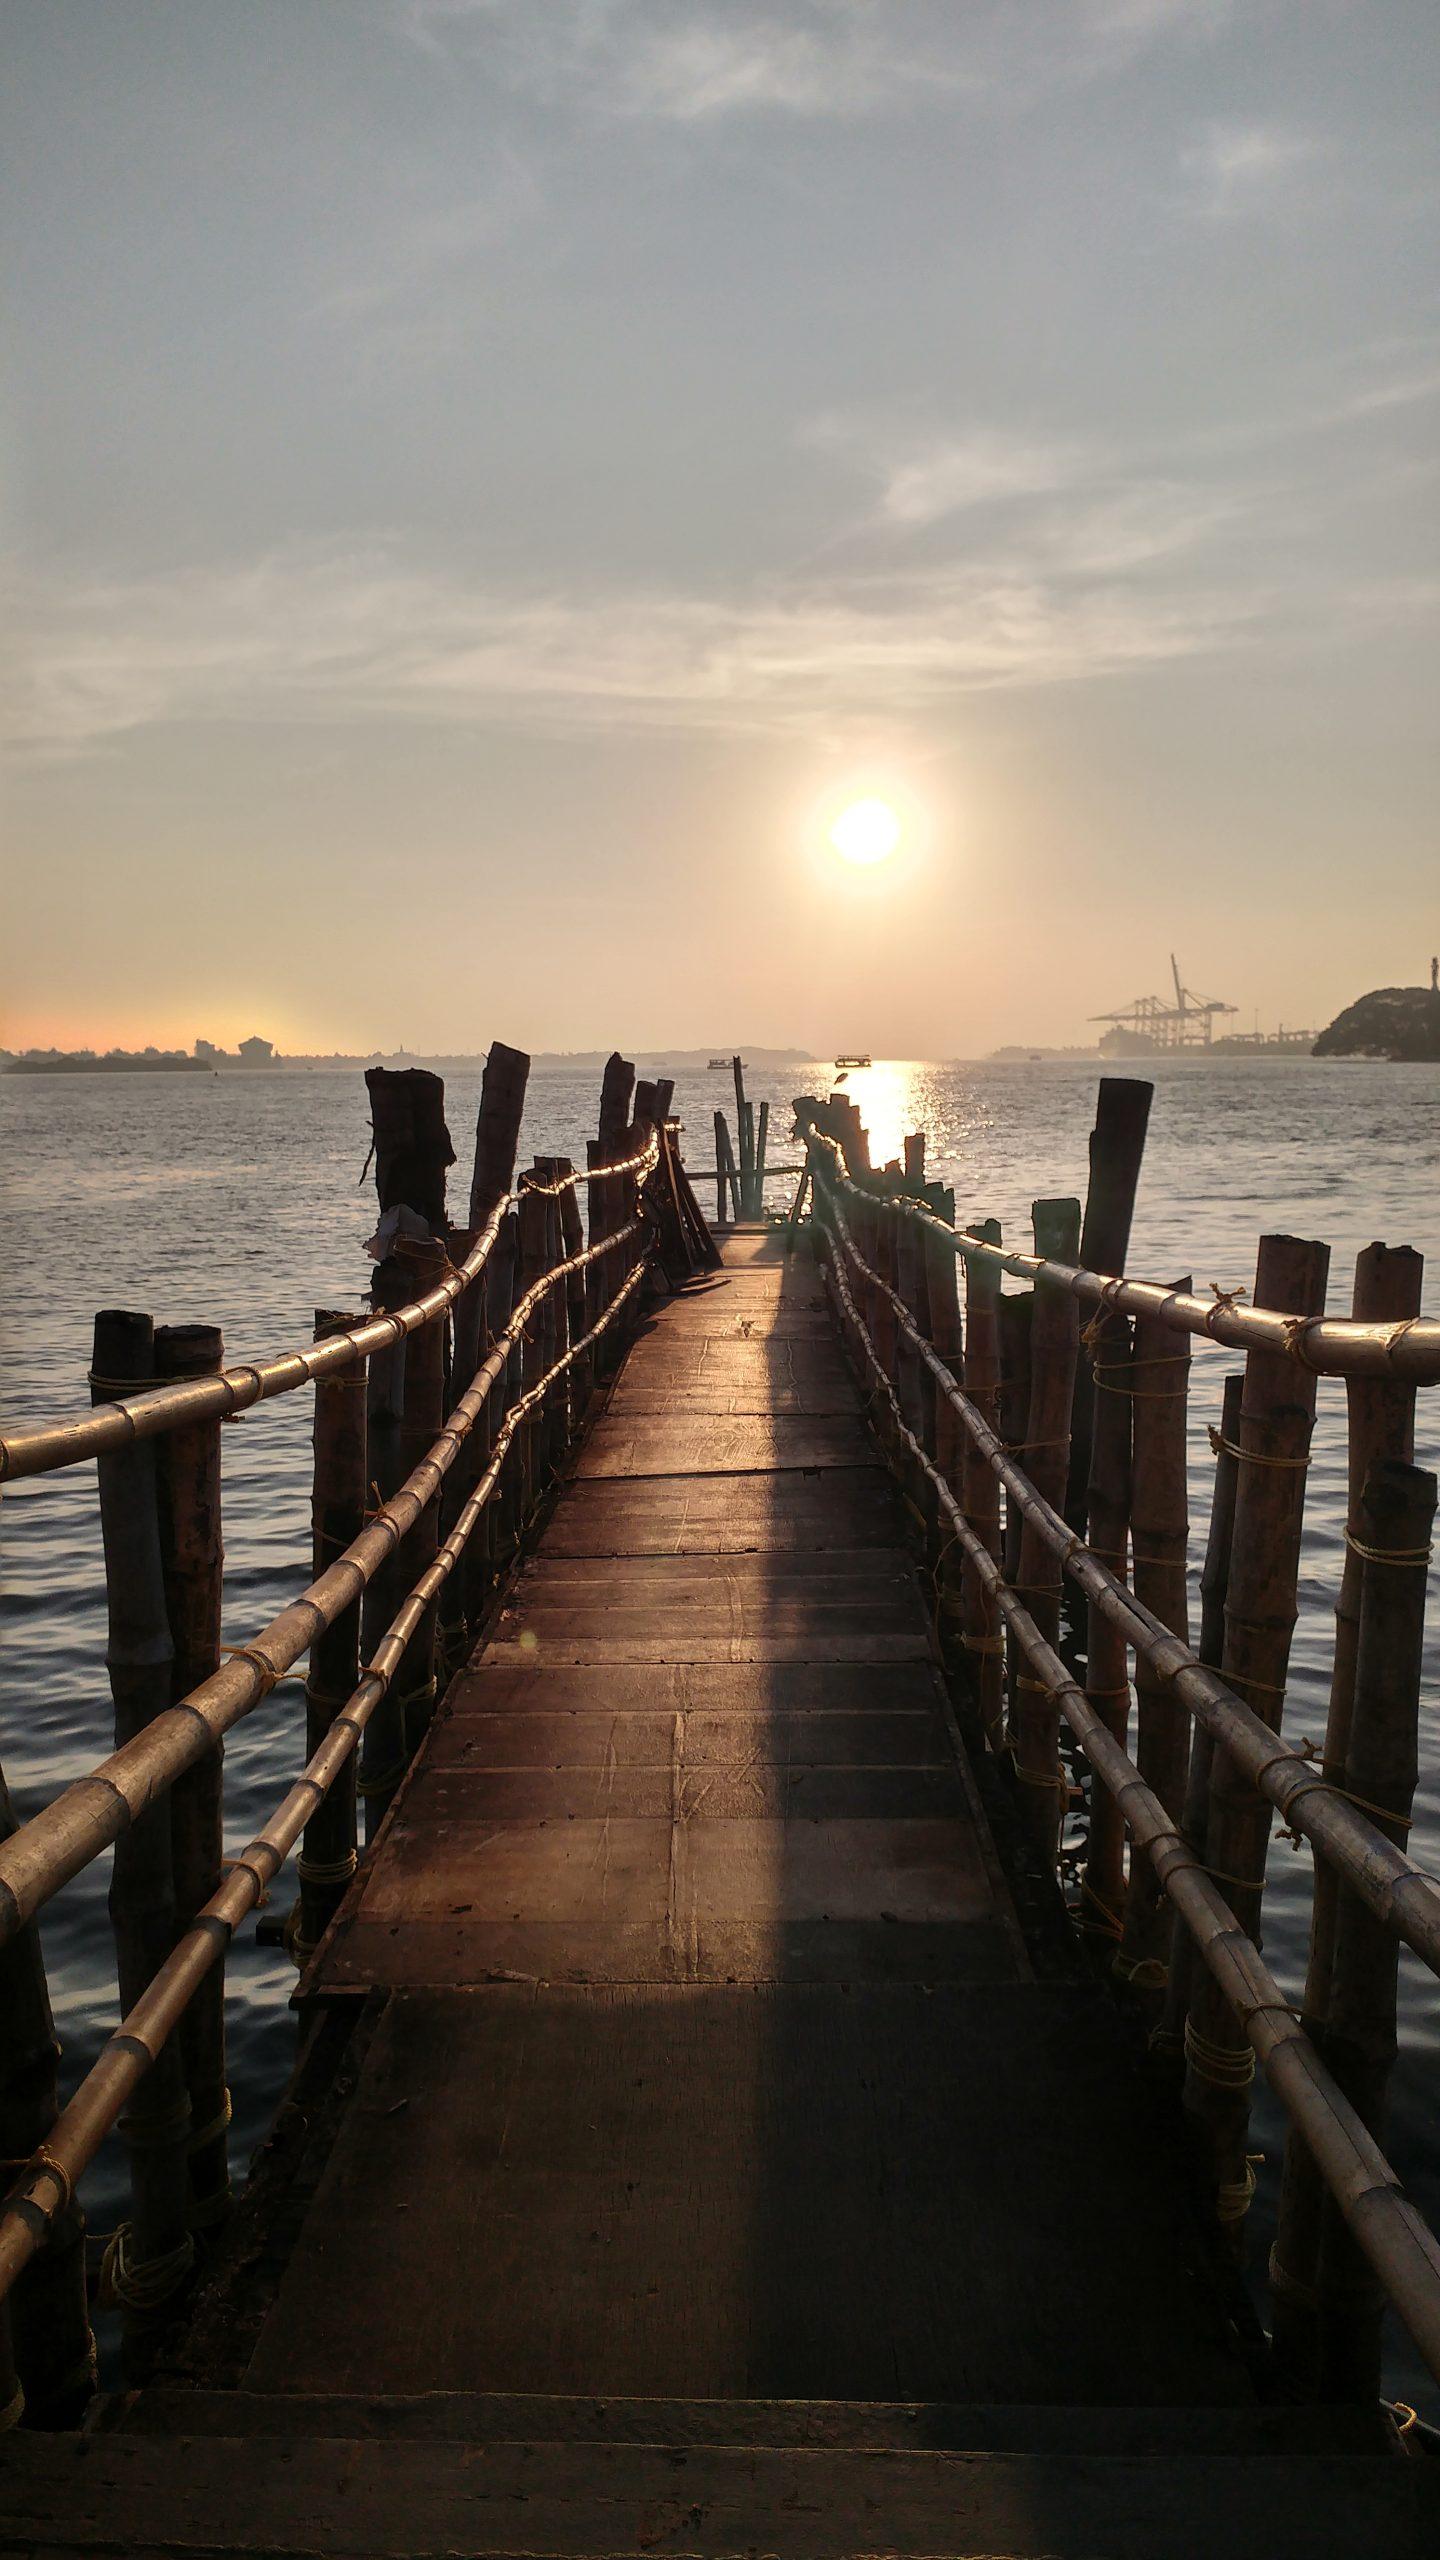 Sunset from a bridge in Marine drive, Kochi.